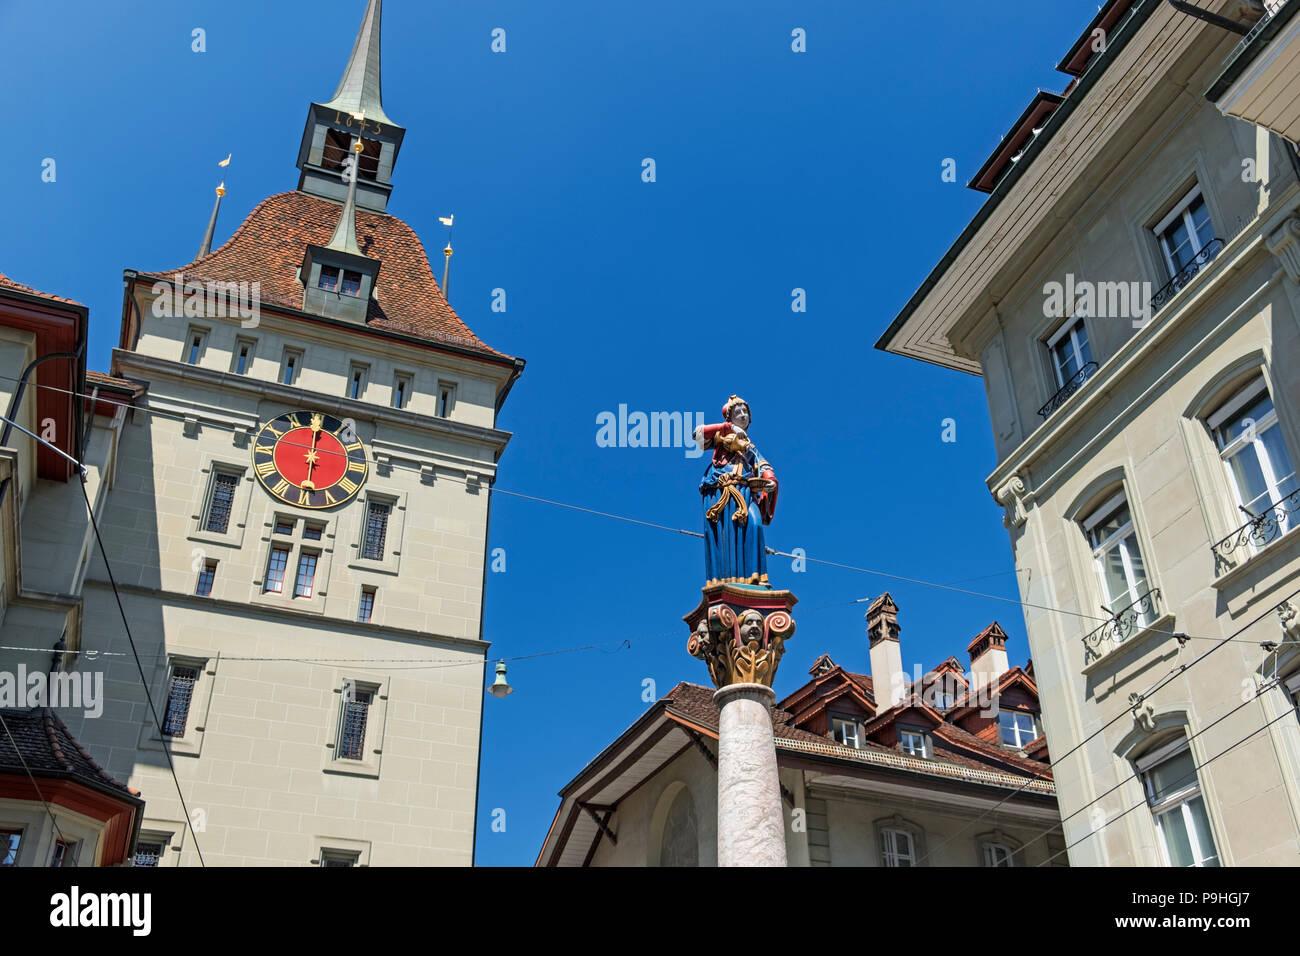 Käfigturm Käfigturm und Anna Seiler Brunnen statue Altstadt Bern Schweiz Stockbild